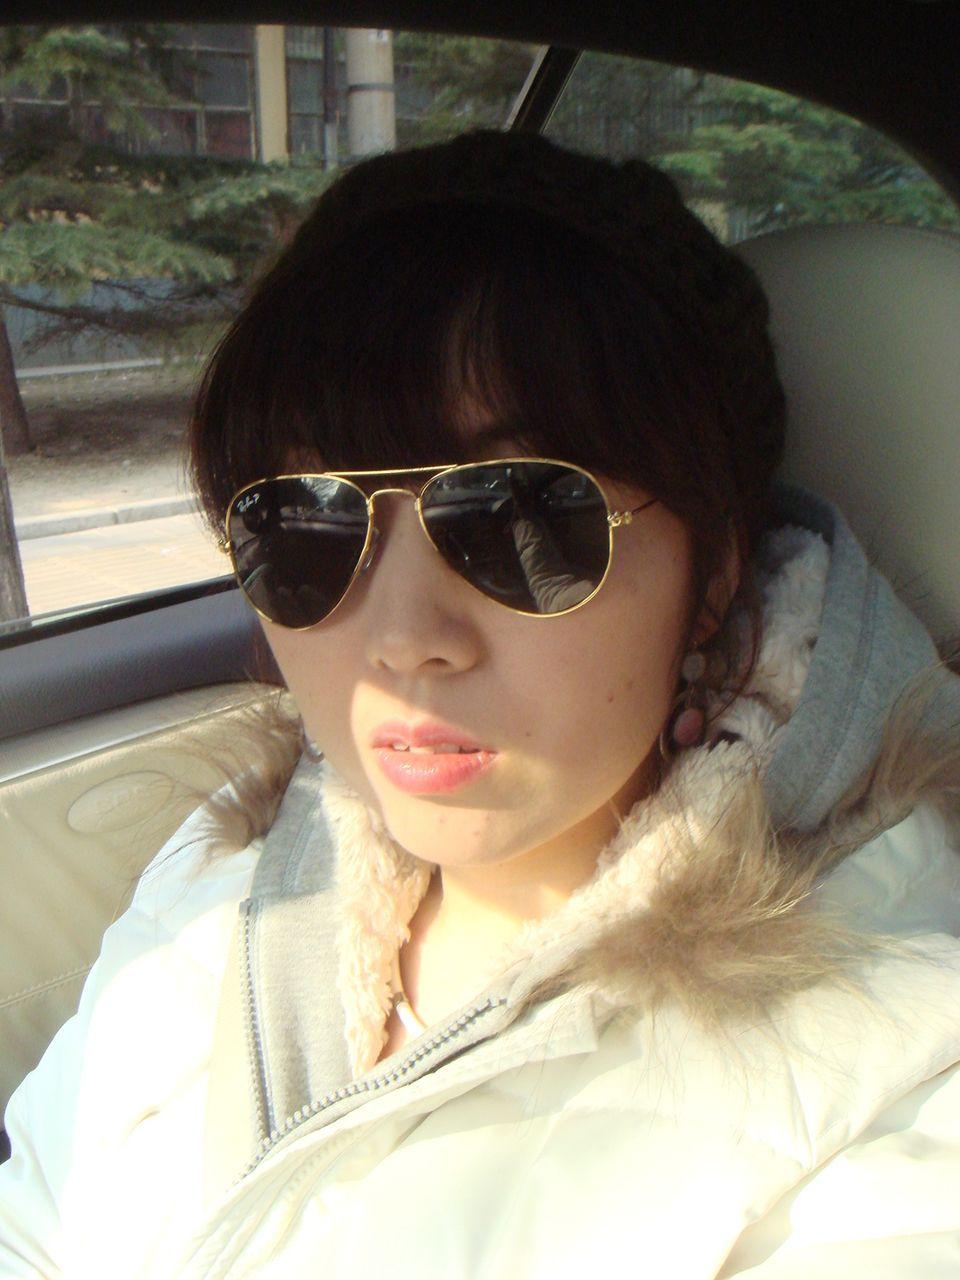 yy东方宝宝无删减版 yy美女主播热舞诱惑720p